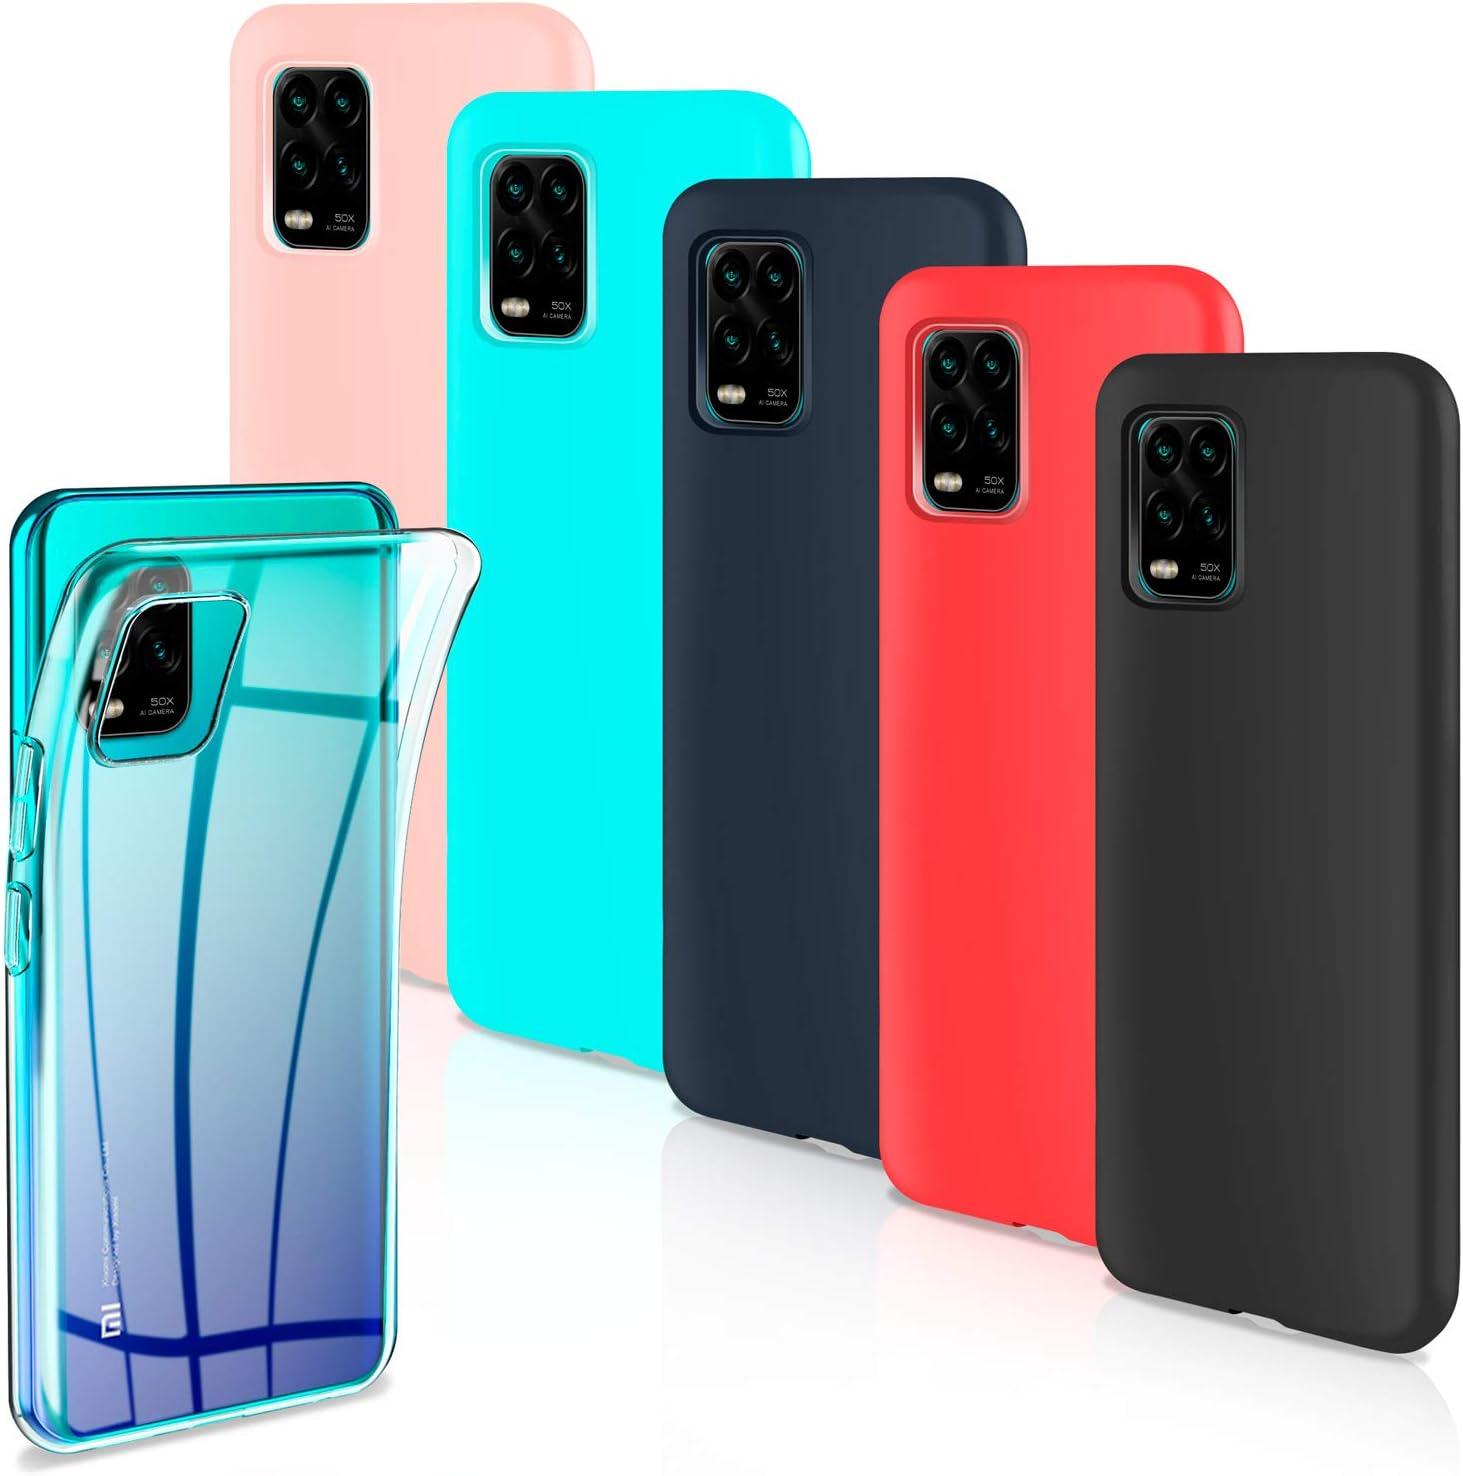 Leathlux 6 x Funda Xiaomi Mi 10 Lite 5G, 6 Unidades Carcasas Juntas Ultra Fina Silicona TPU Flexible Colores Carcasas Xiaomi Mi 10 Lite 5G 6.57